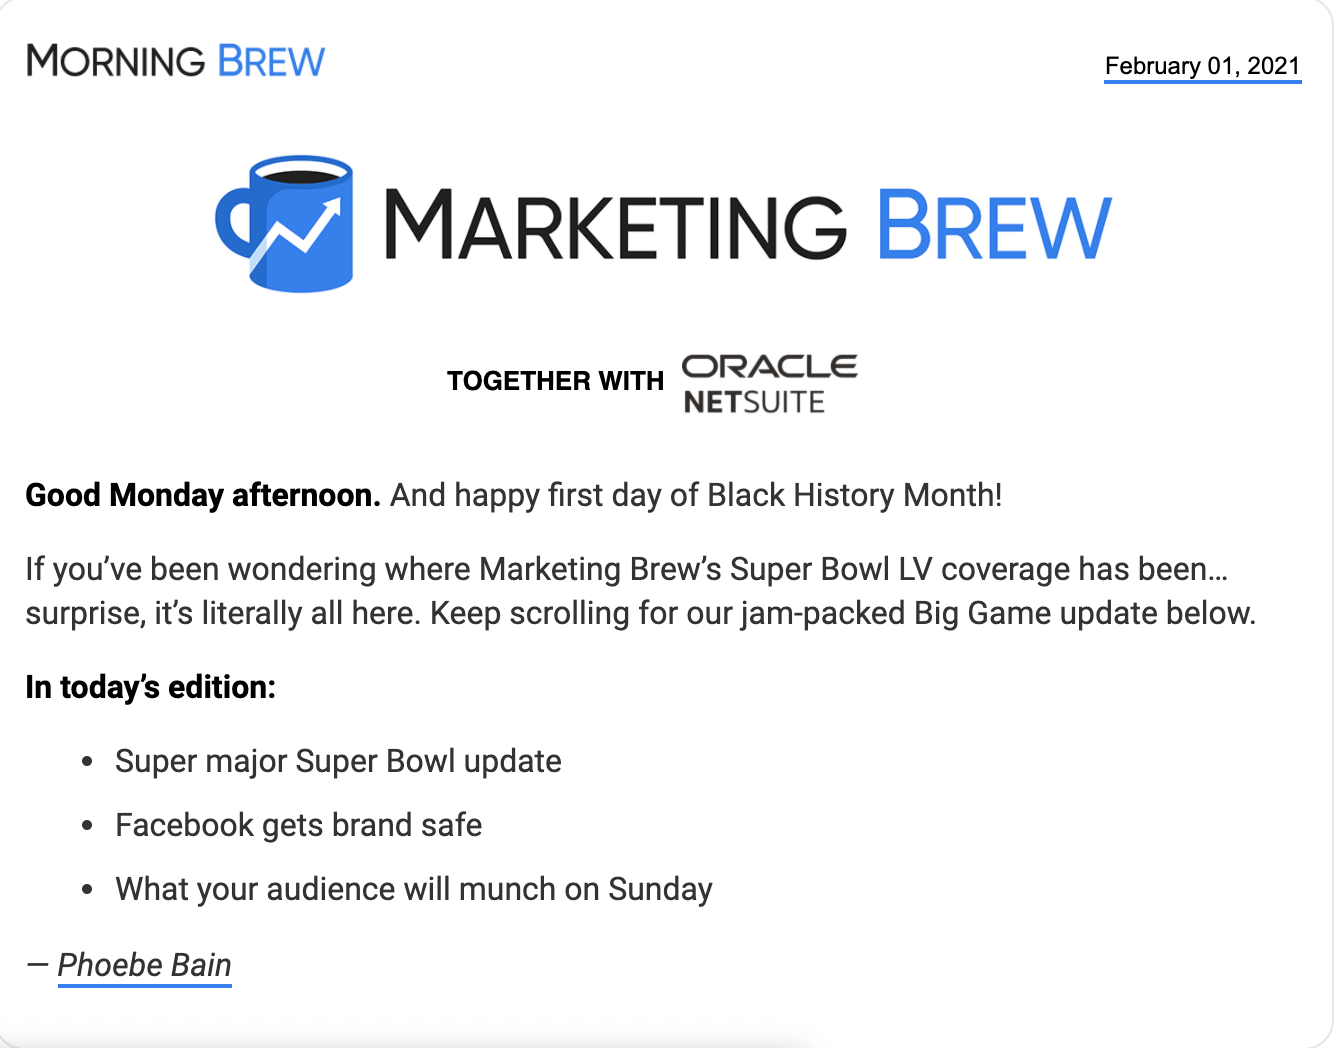 5 Best Copywriting Formulas for Email Marketing